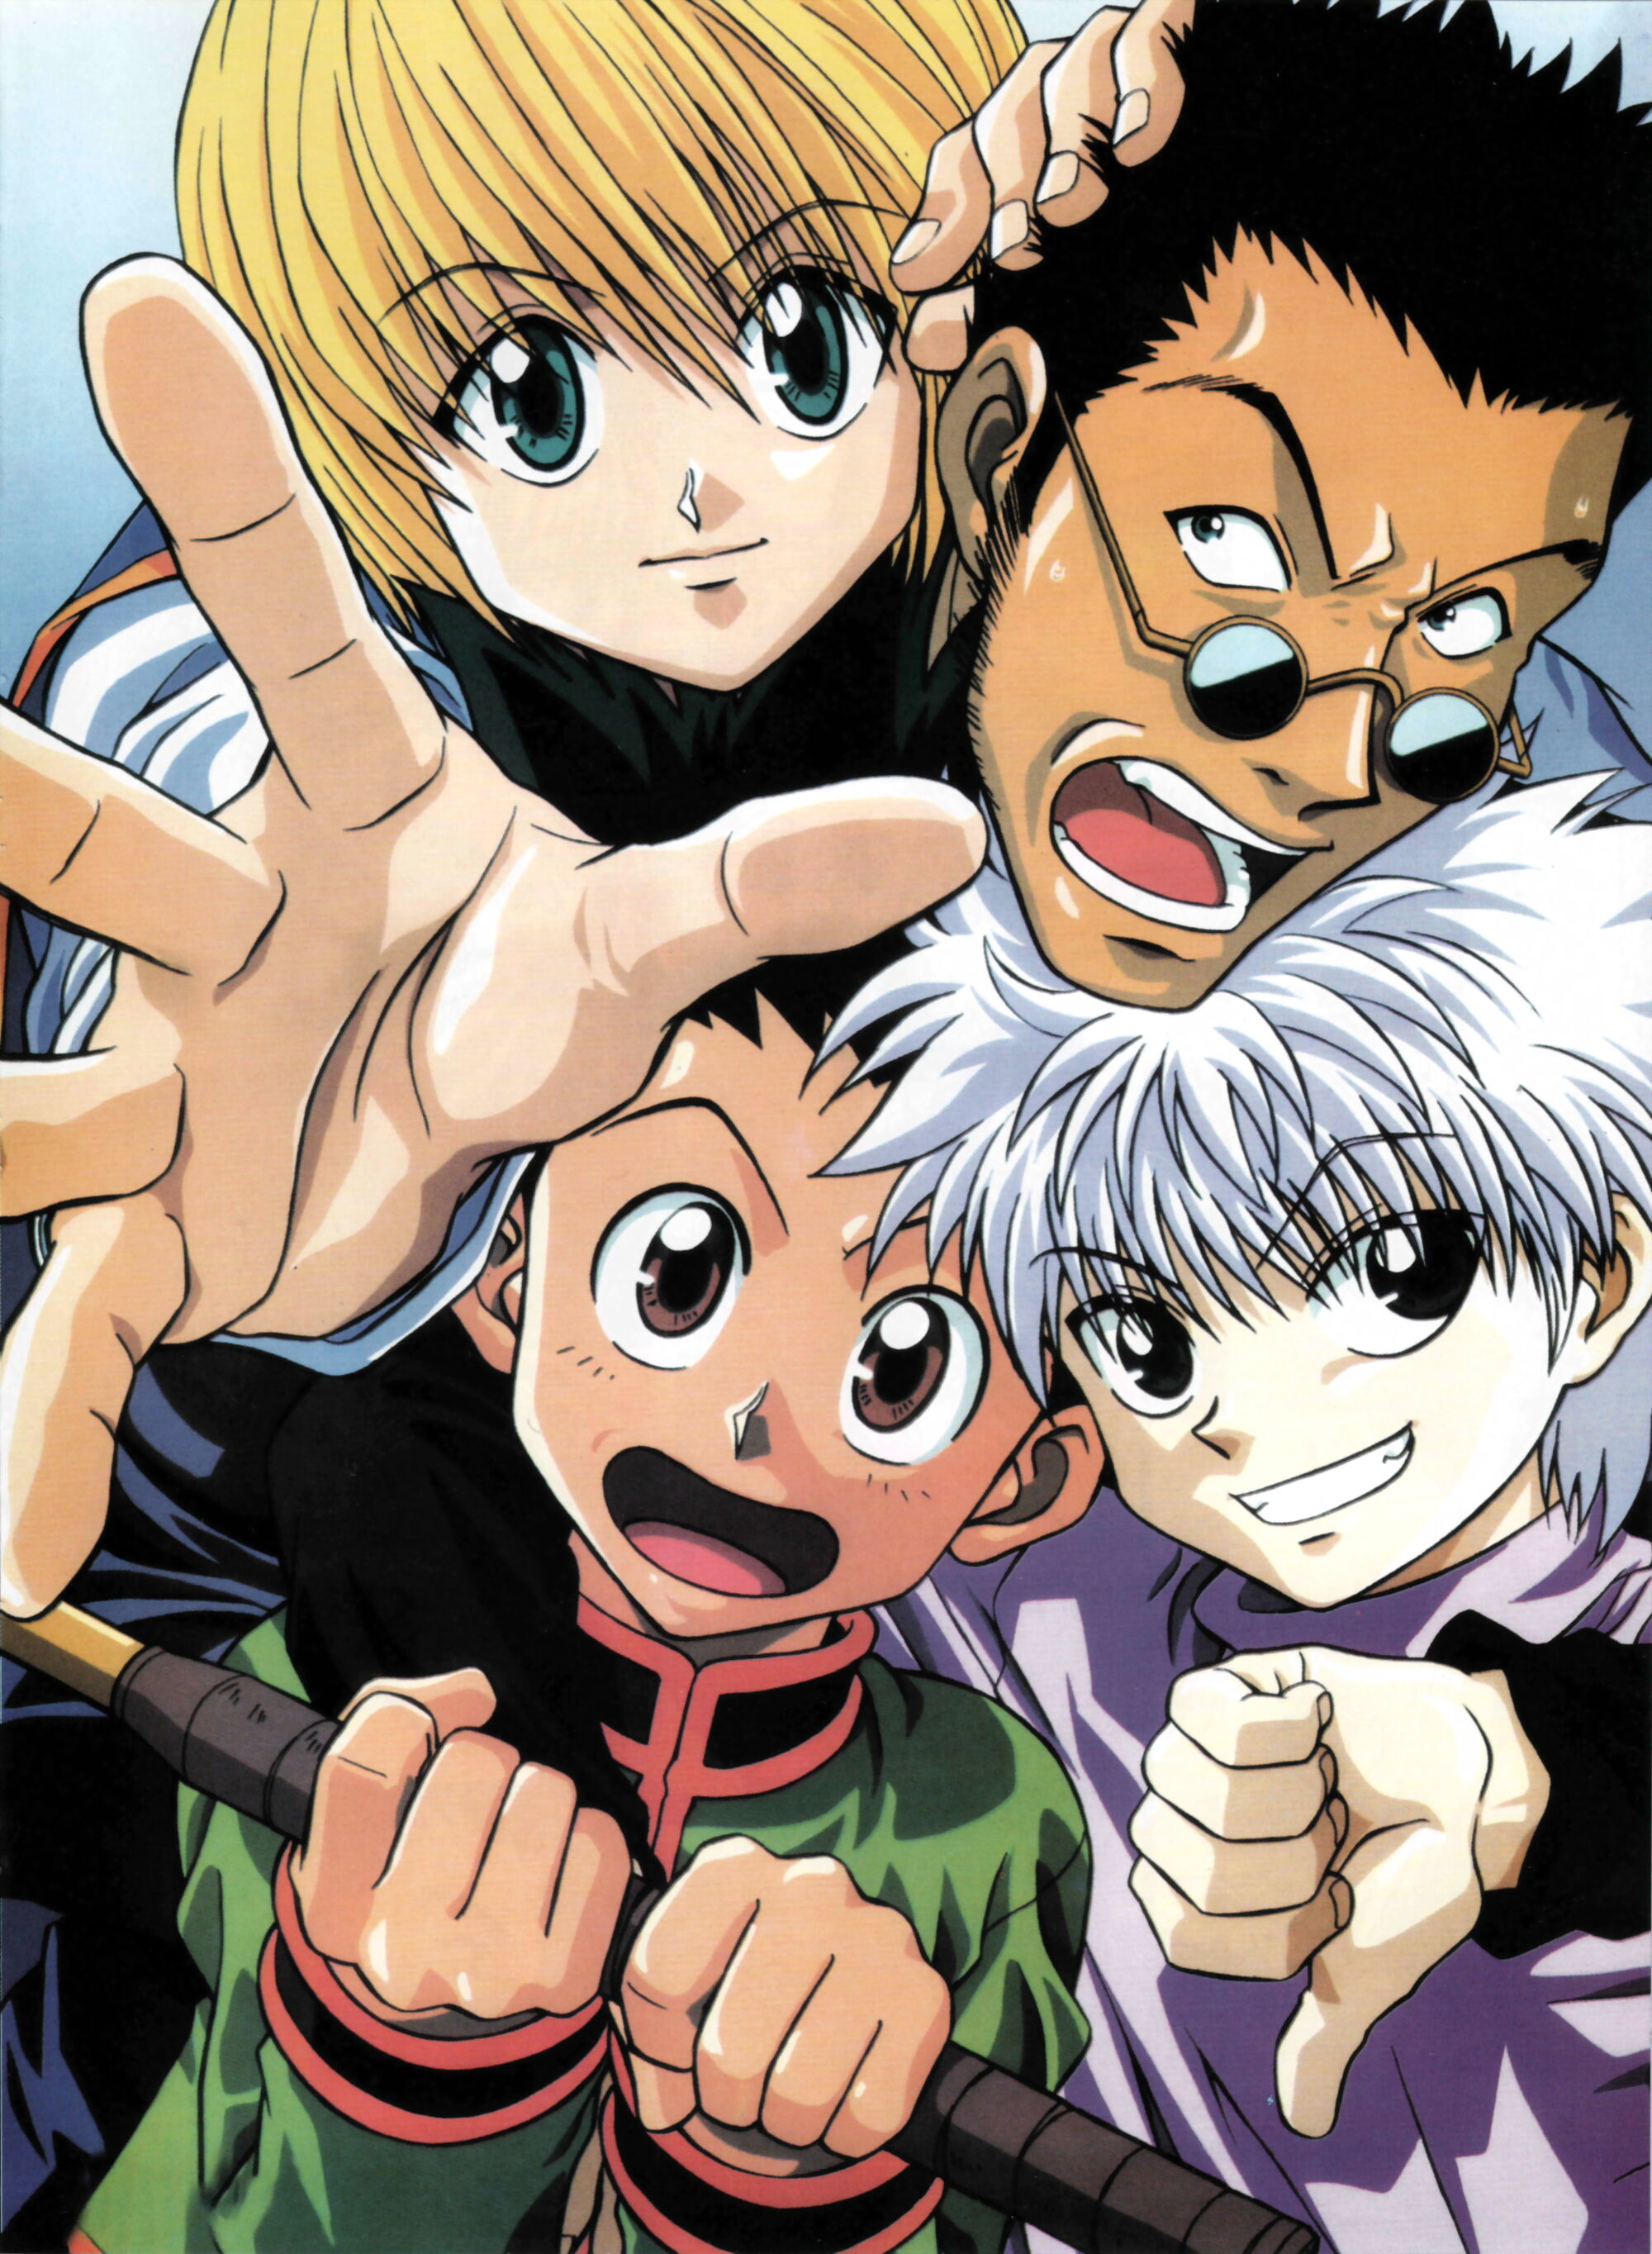 Hunter x Hunter (1999 Anime) | Japanese Anime Wiki ...